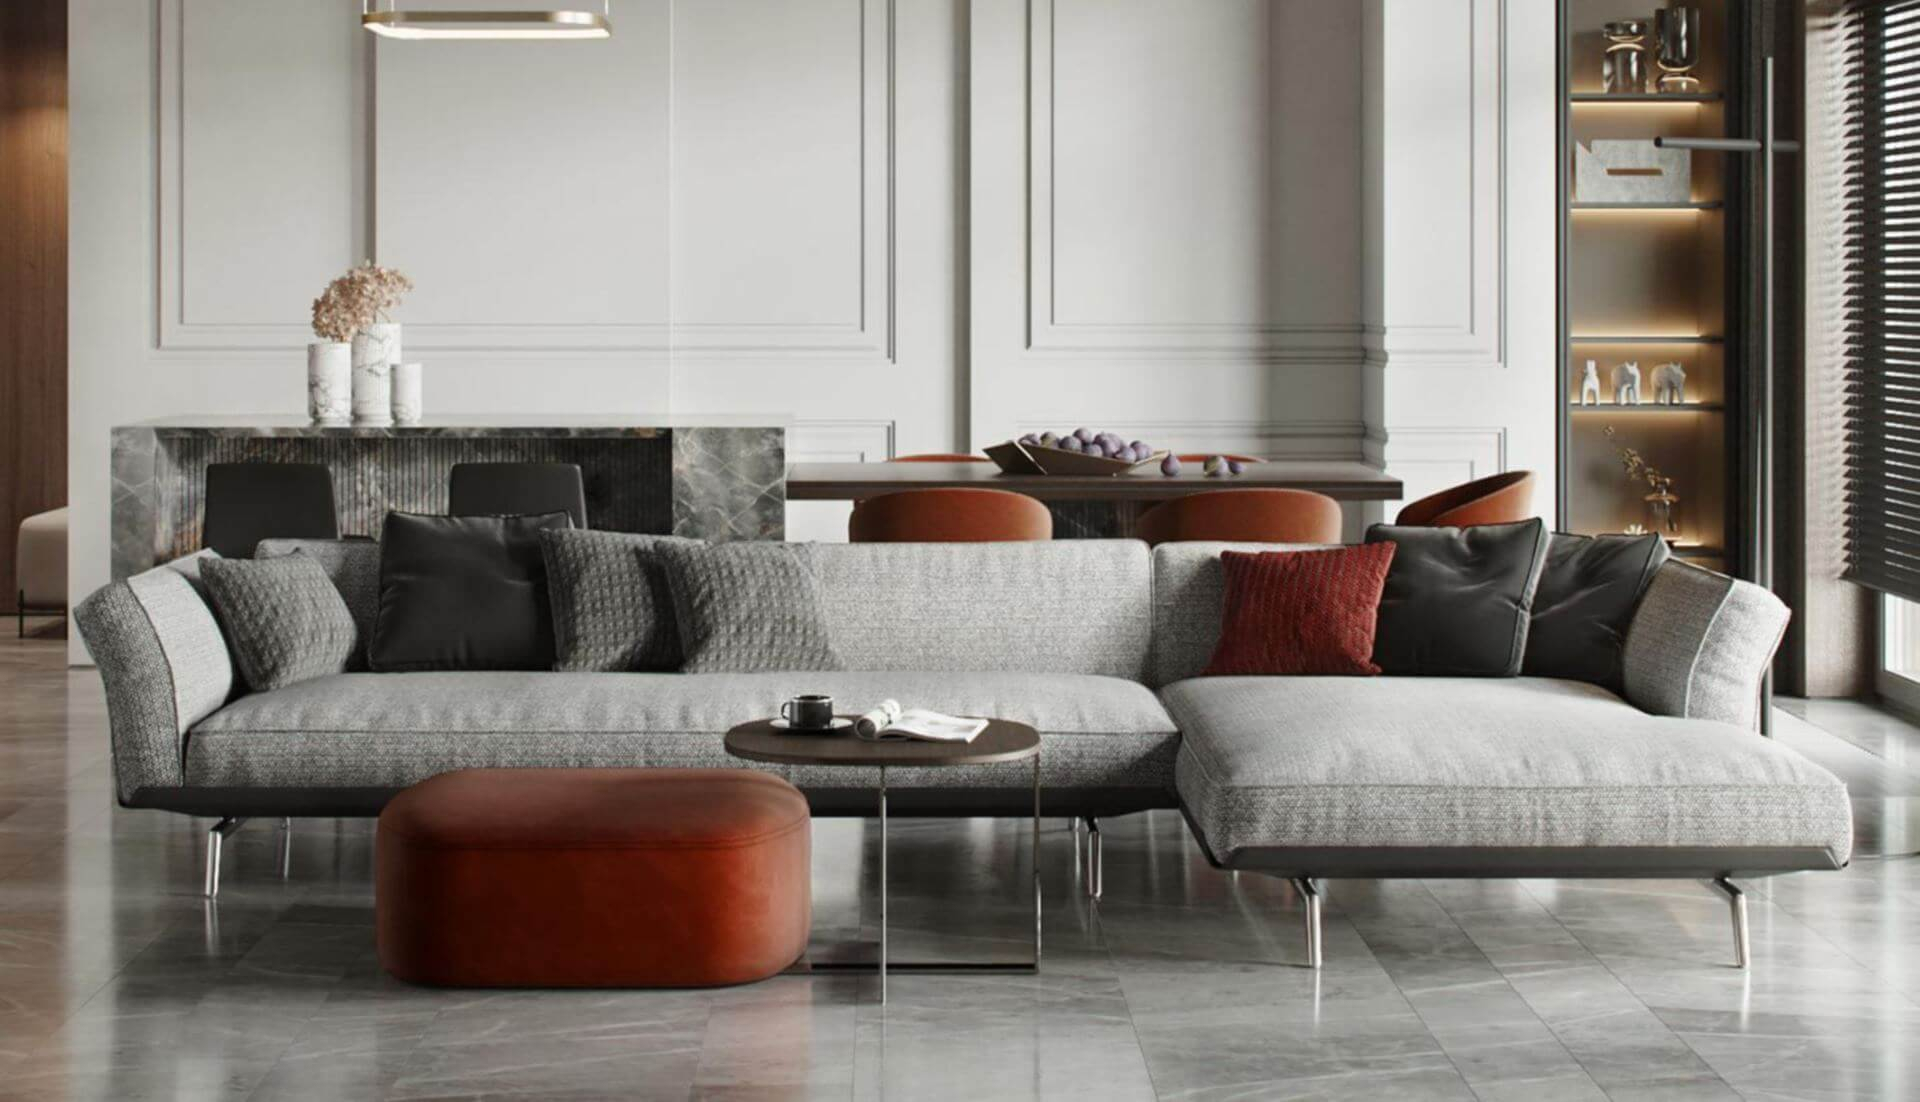 Flexform Este Modular Sofa – Dream Design Interiors Ltd Within Dream Navy 3 Piece Modular Sofas (View 15 of 15)